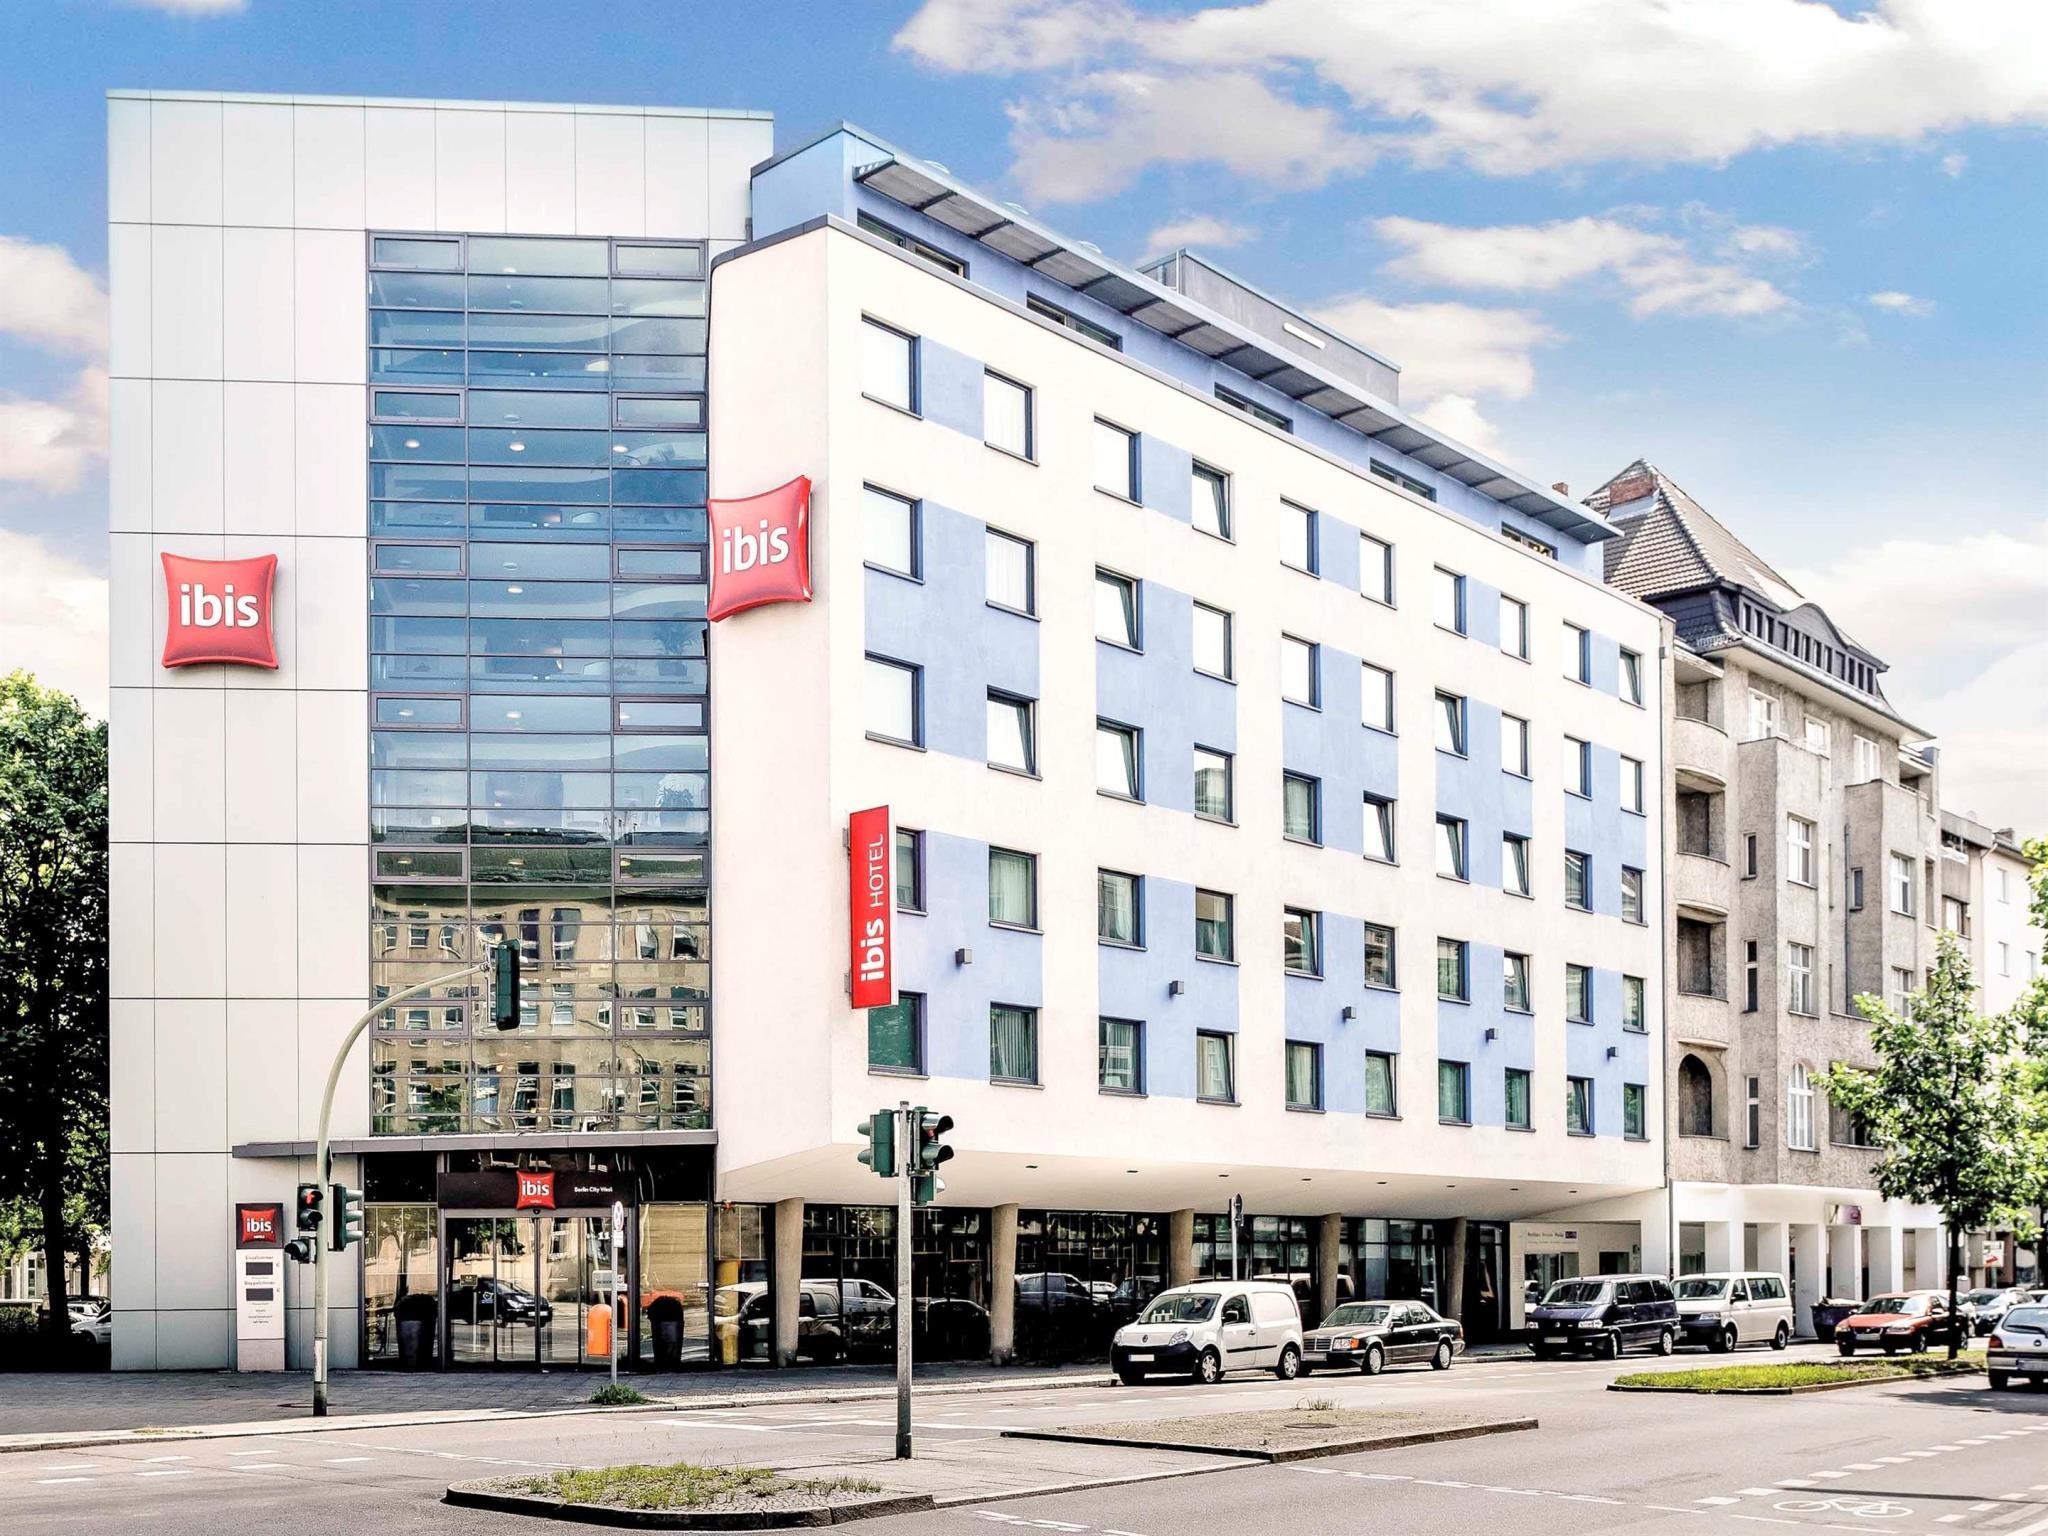 ibis hoteller i tyskland